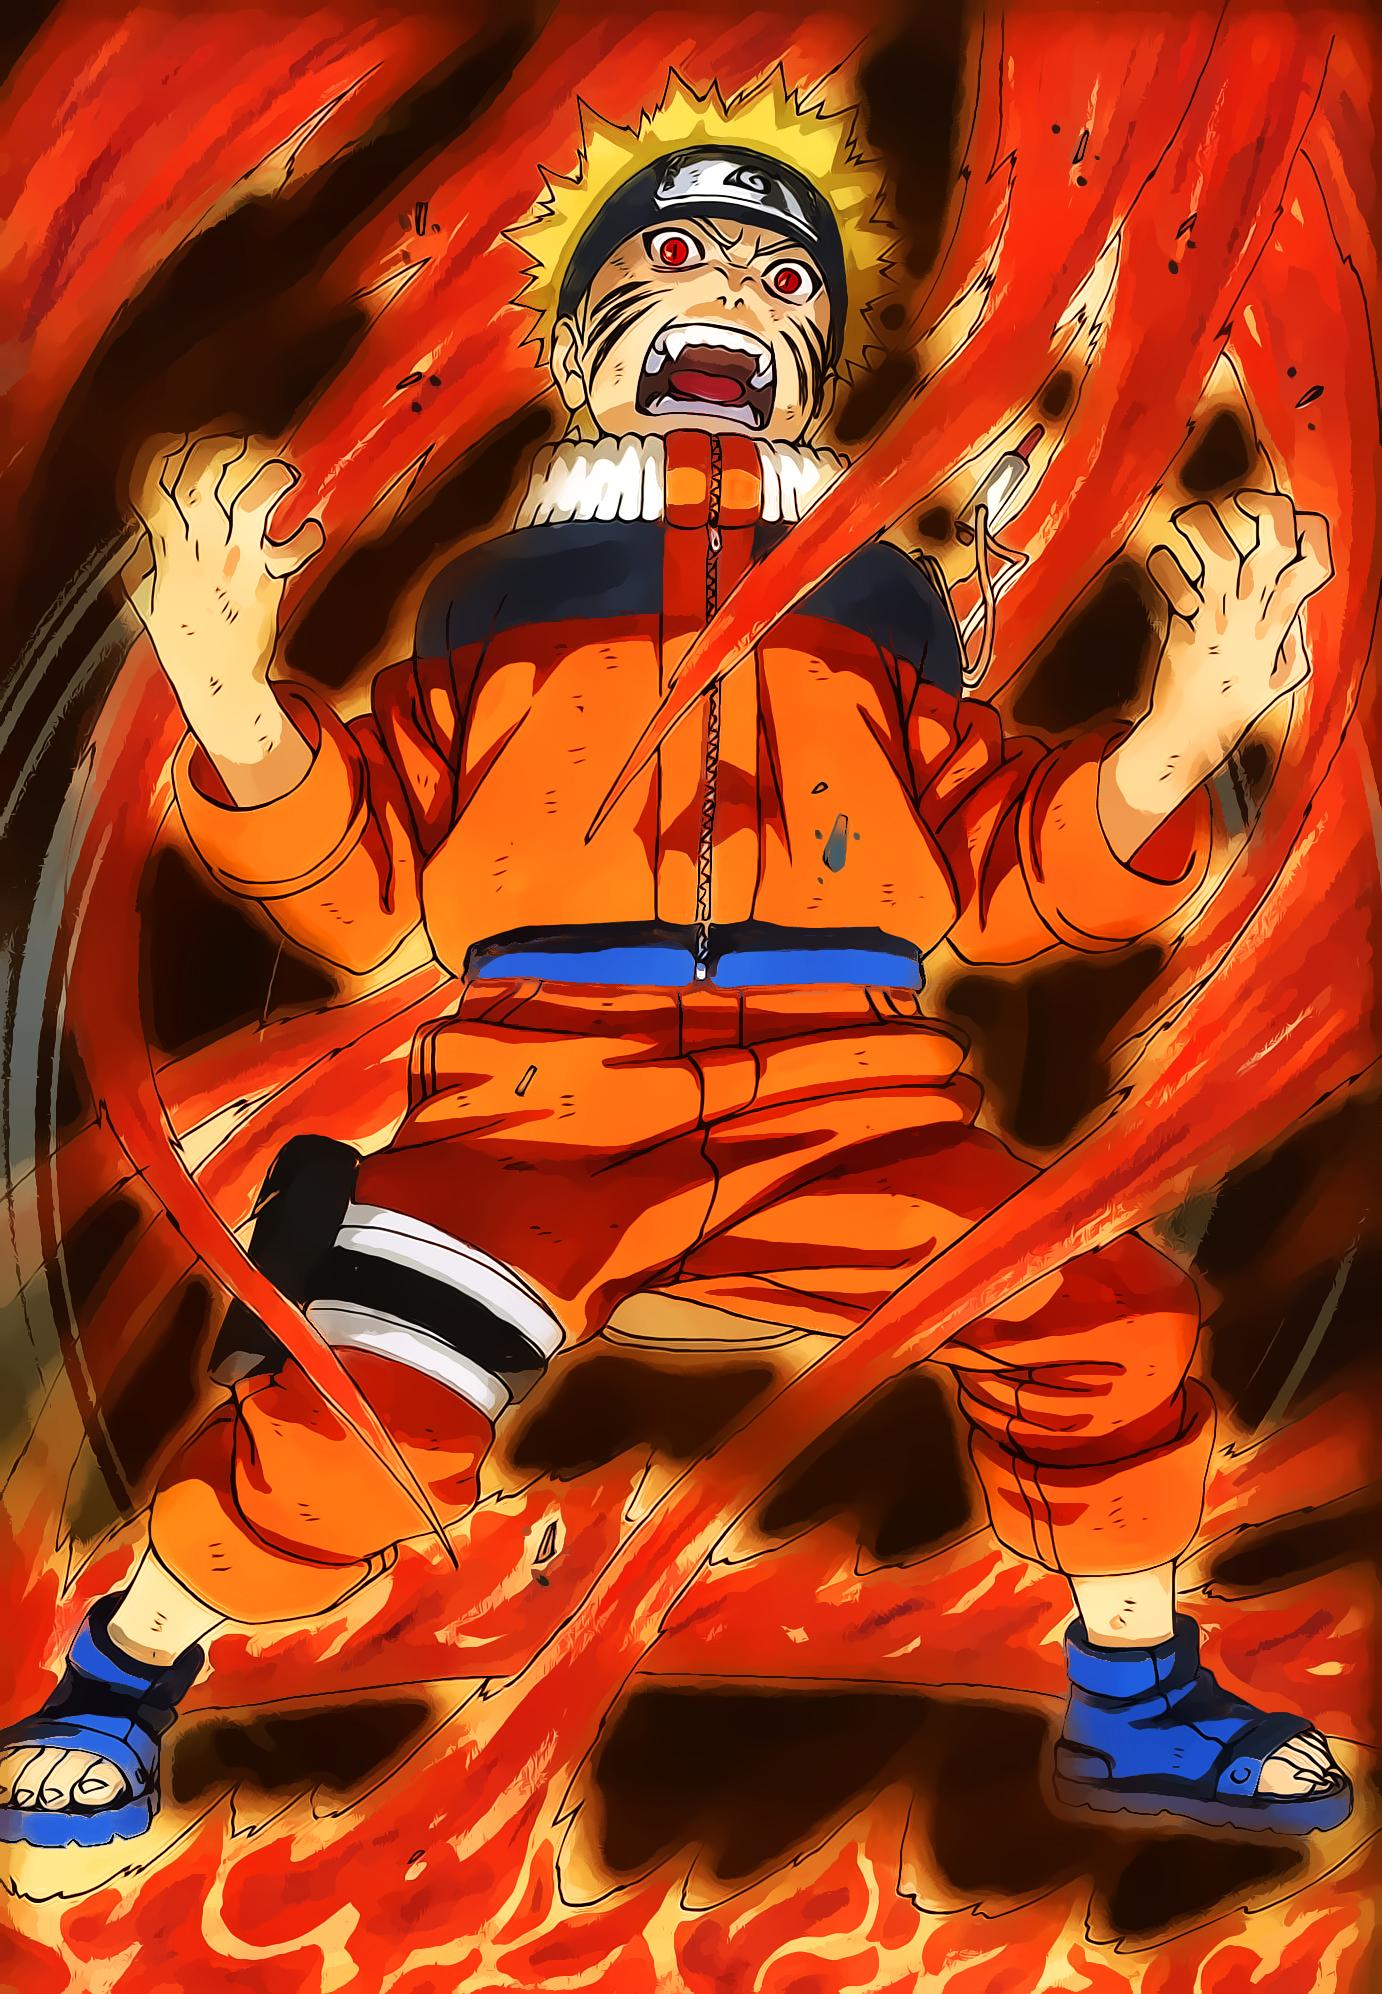 Wonderful Wallpaper Naruto Fox - naruto_fox_chakra_hd_by_stiflerneonizz-d36robh  Trends_599054.jpg